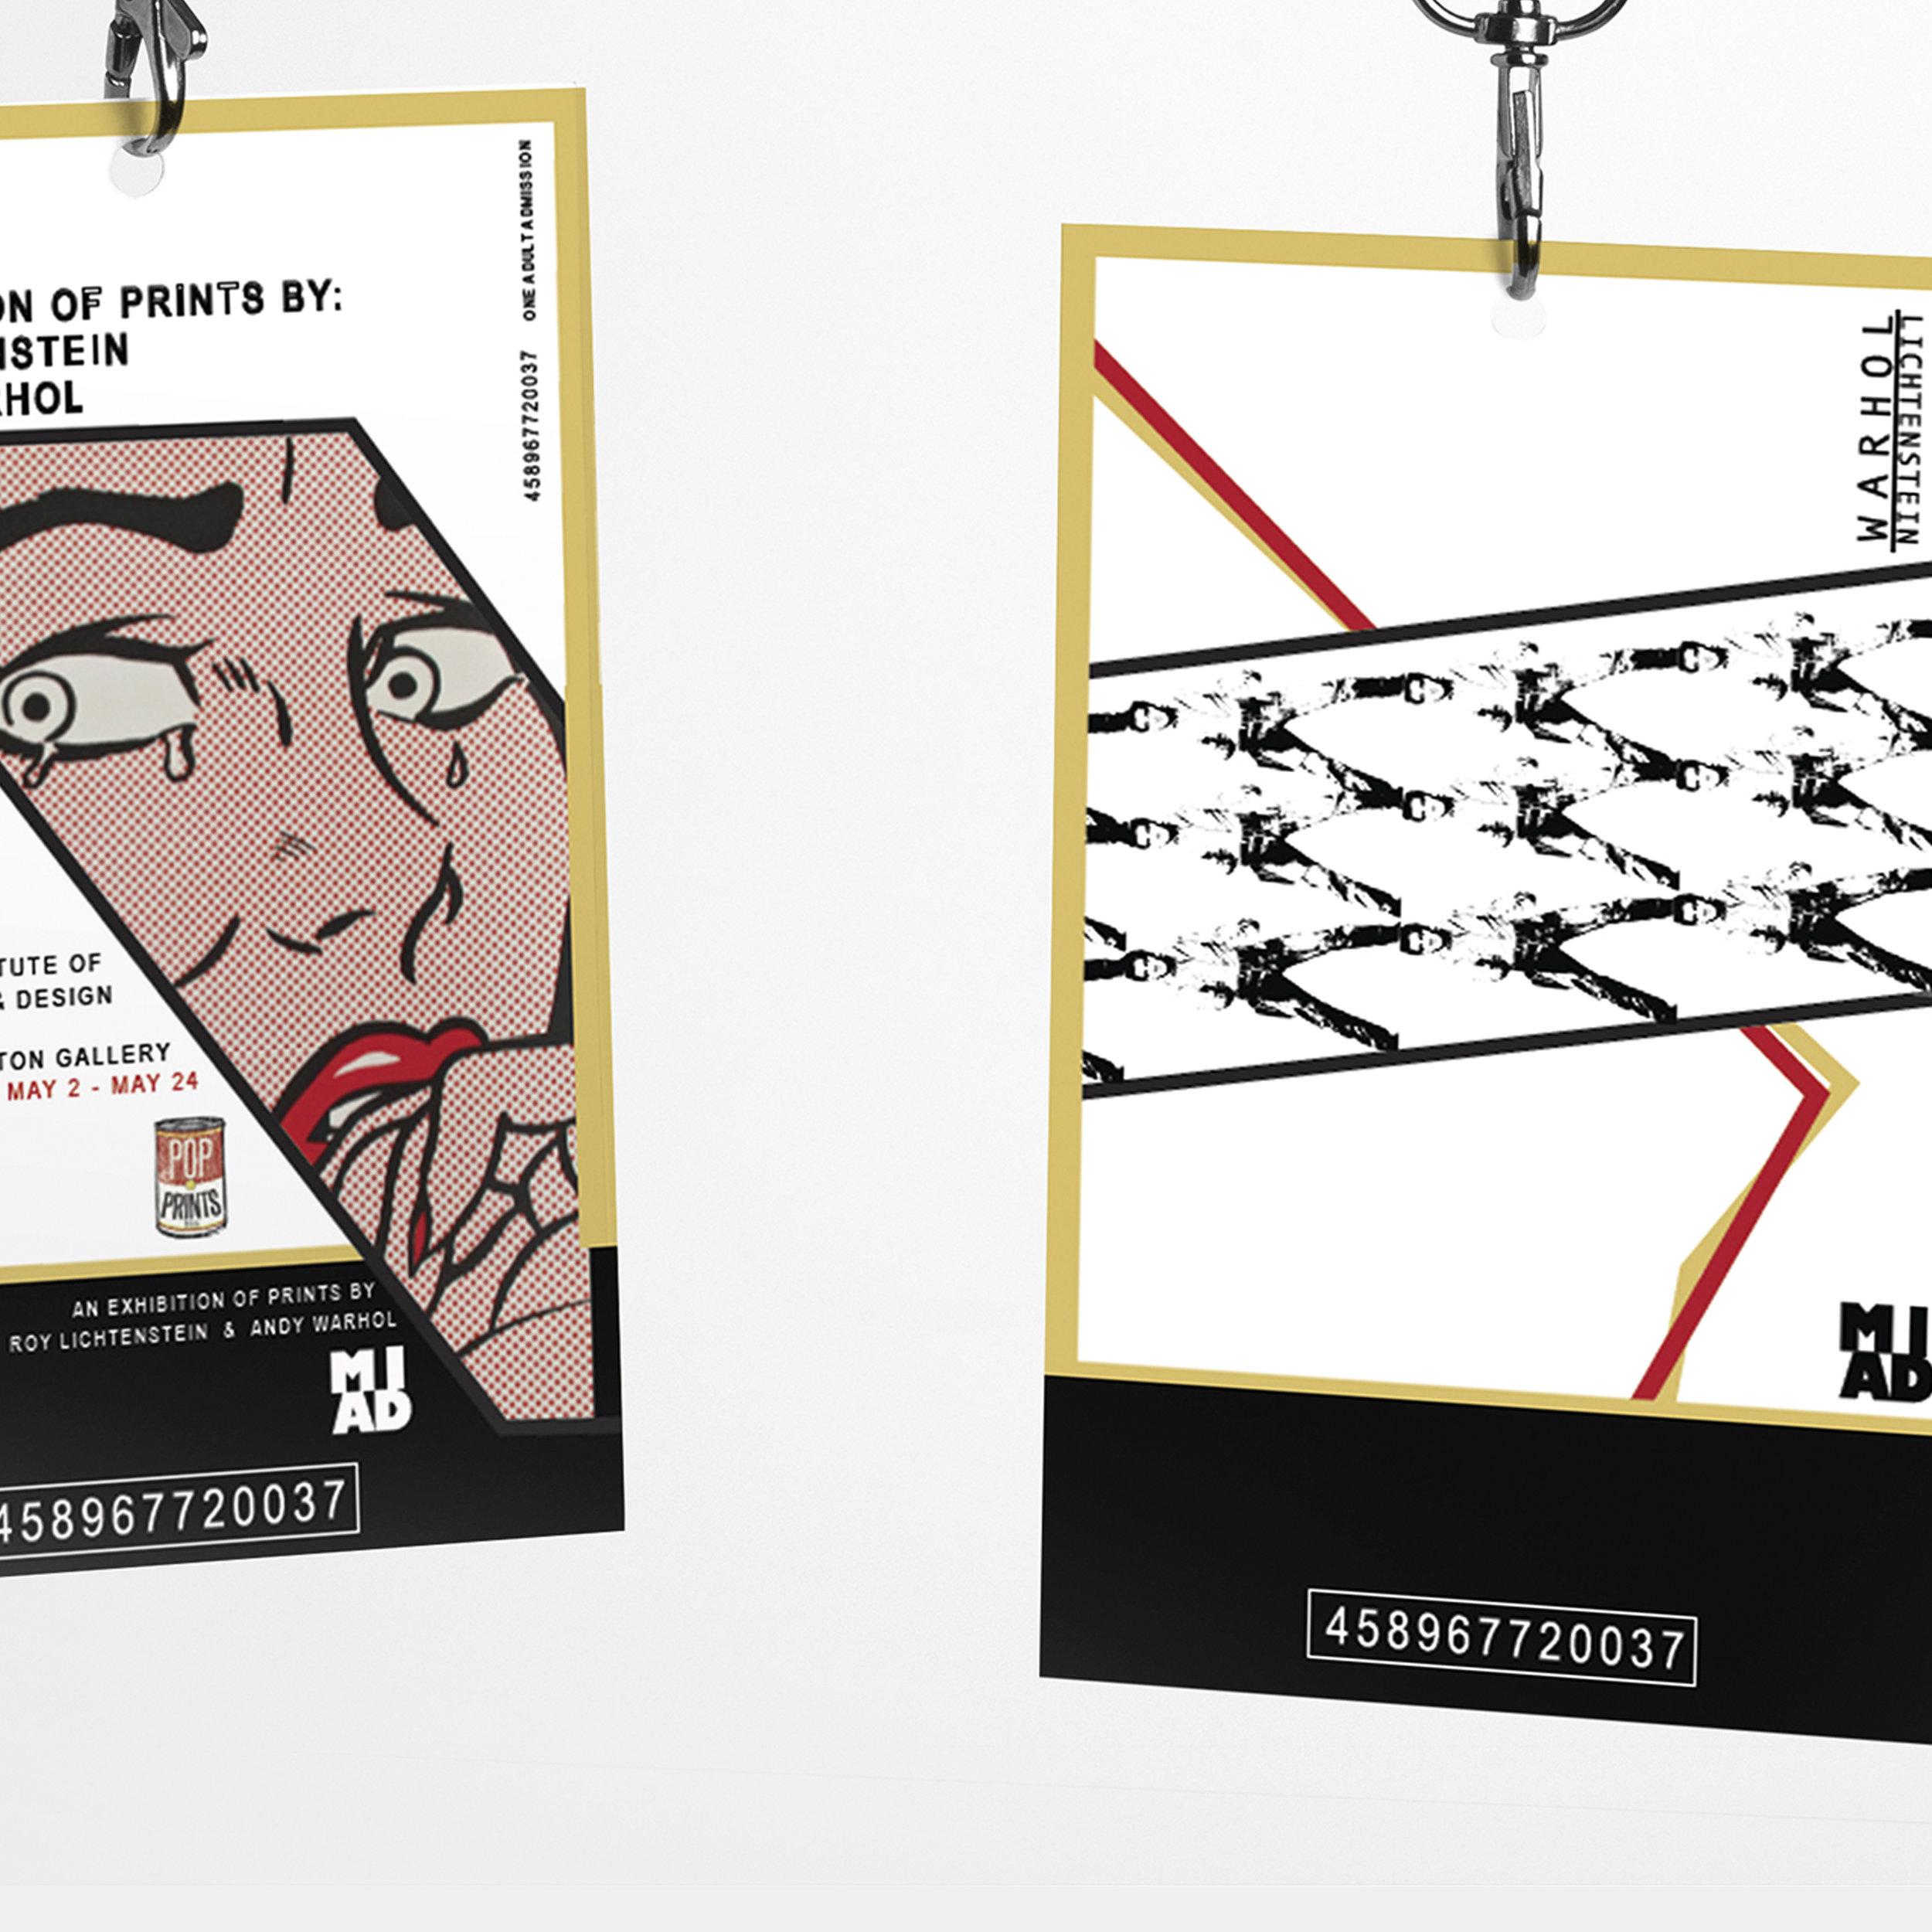 Mahr design_pop prints6.jpg